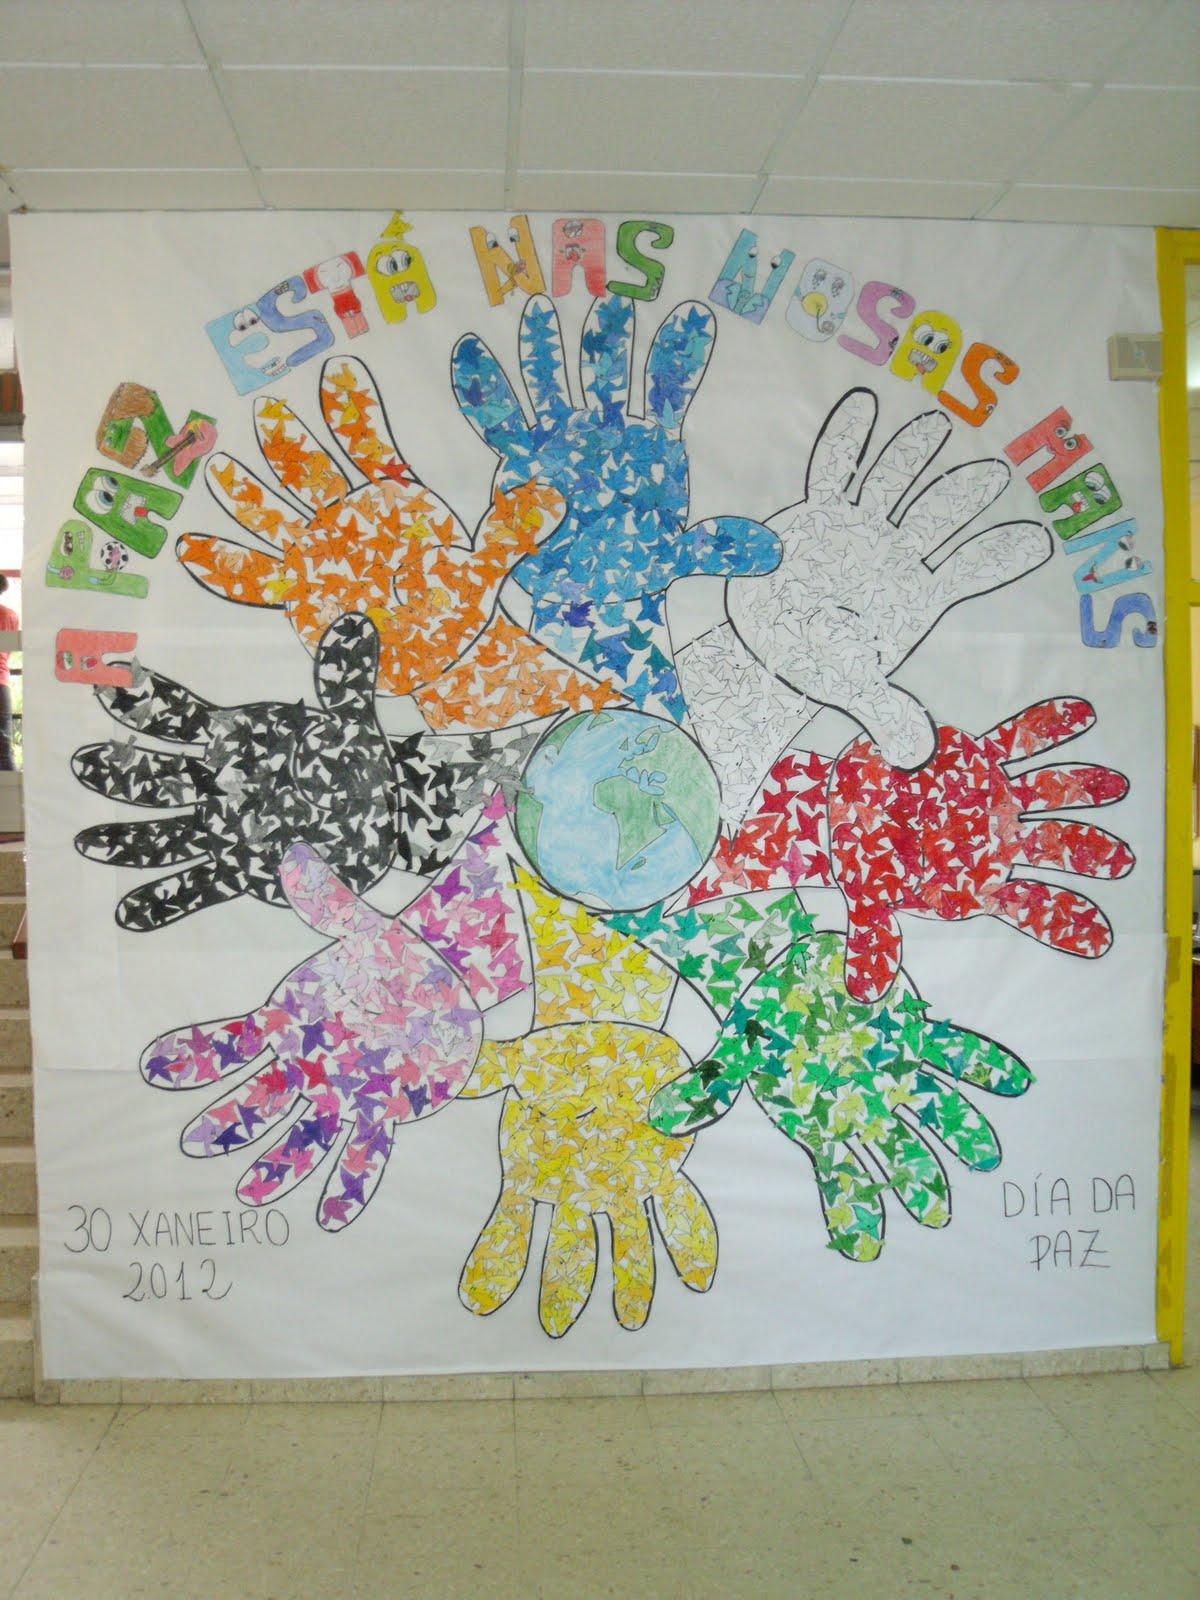 Actividades extraescolares san tom mural da paz a paz for El mundo de la decoracion